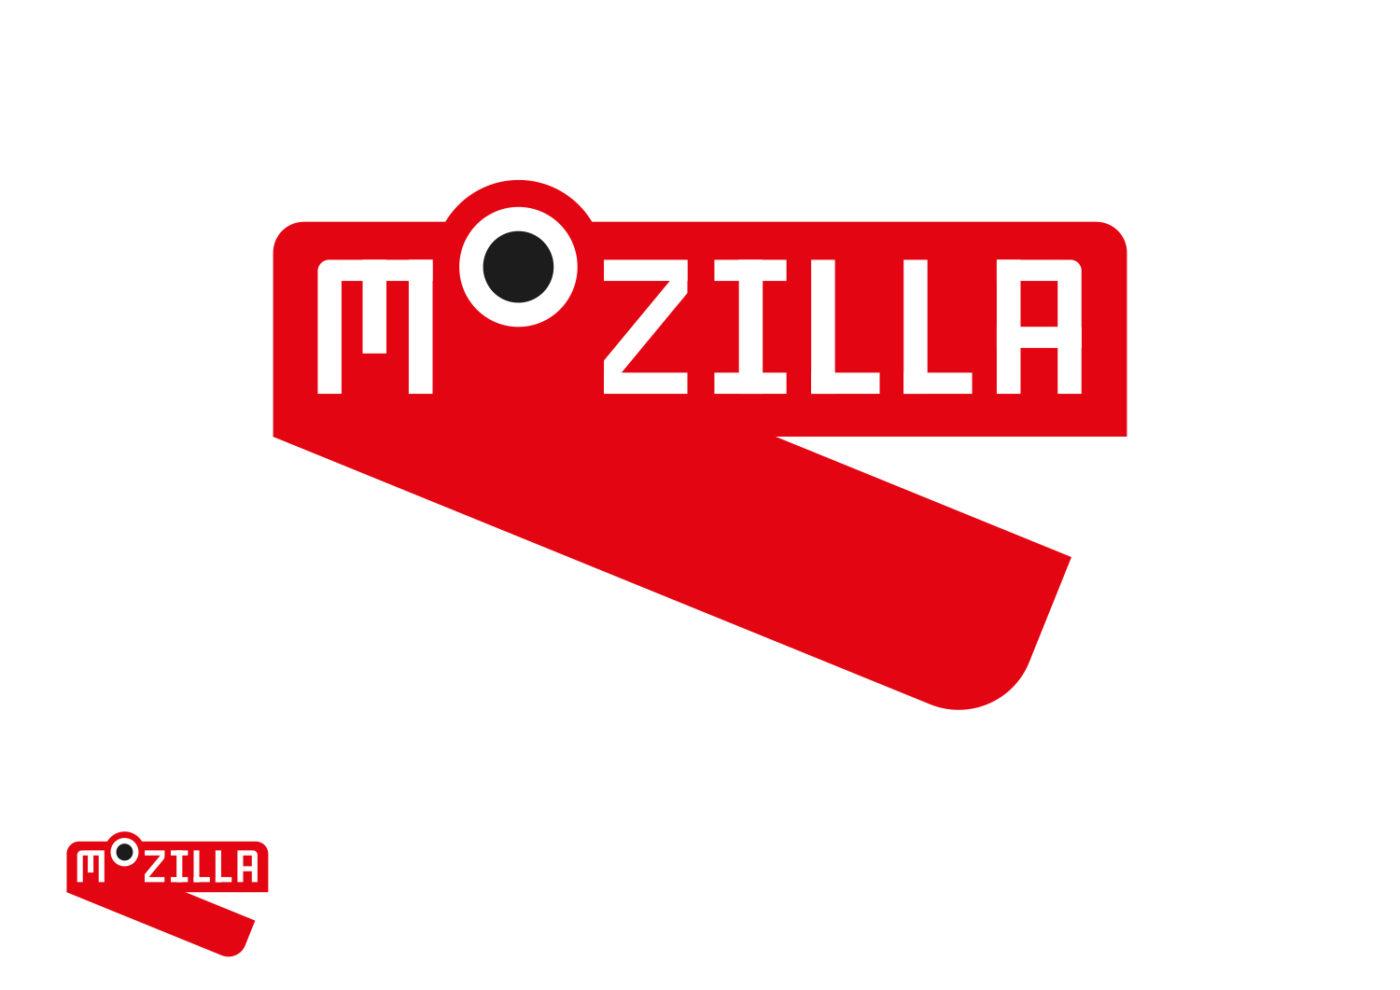 jb_mozilla-sept_a_dino_1-1400x990